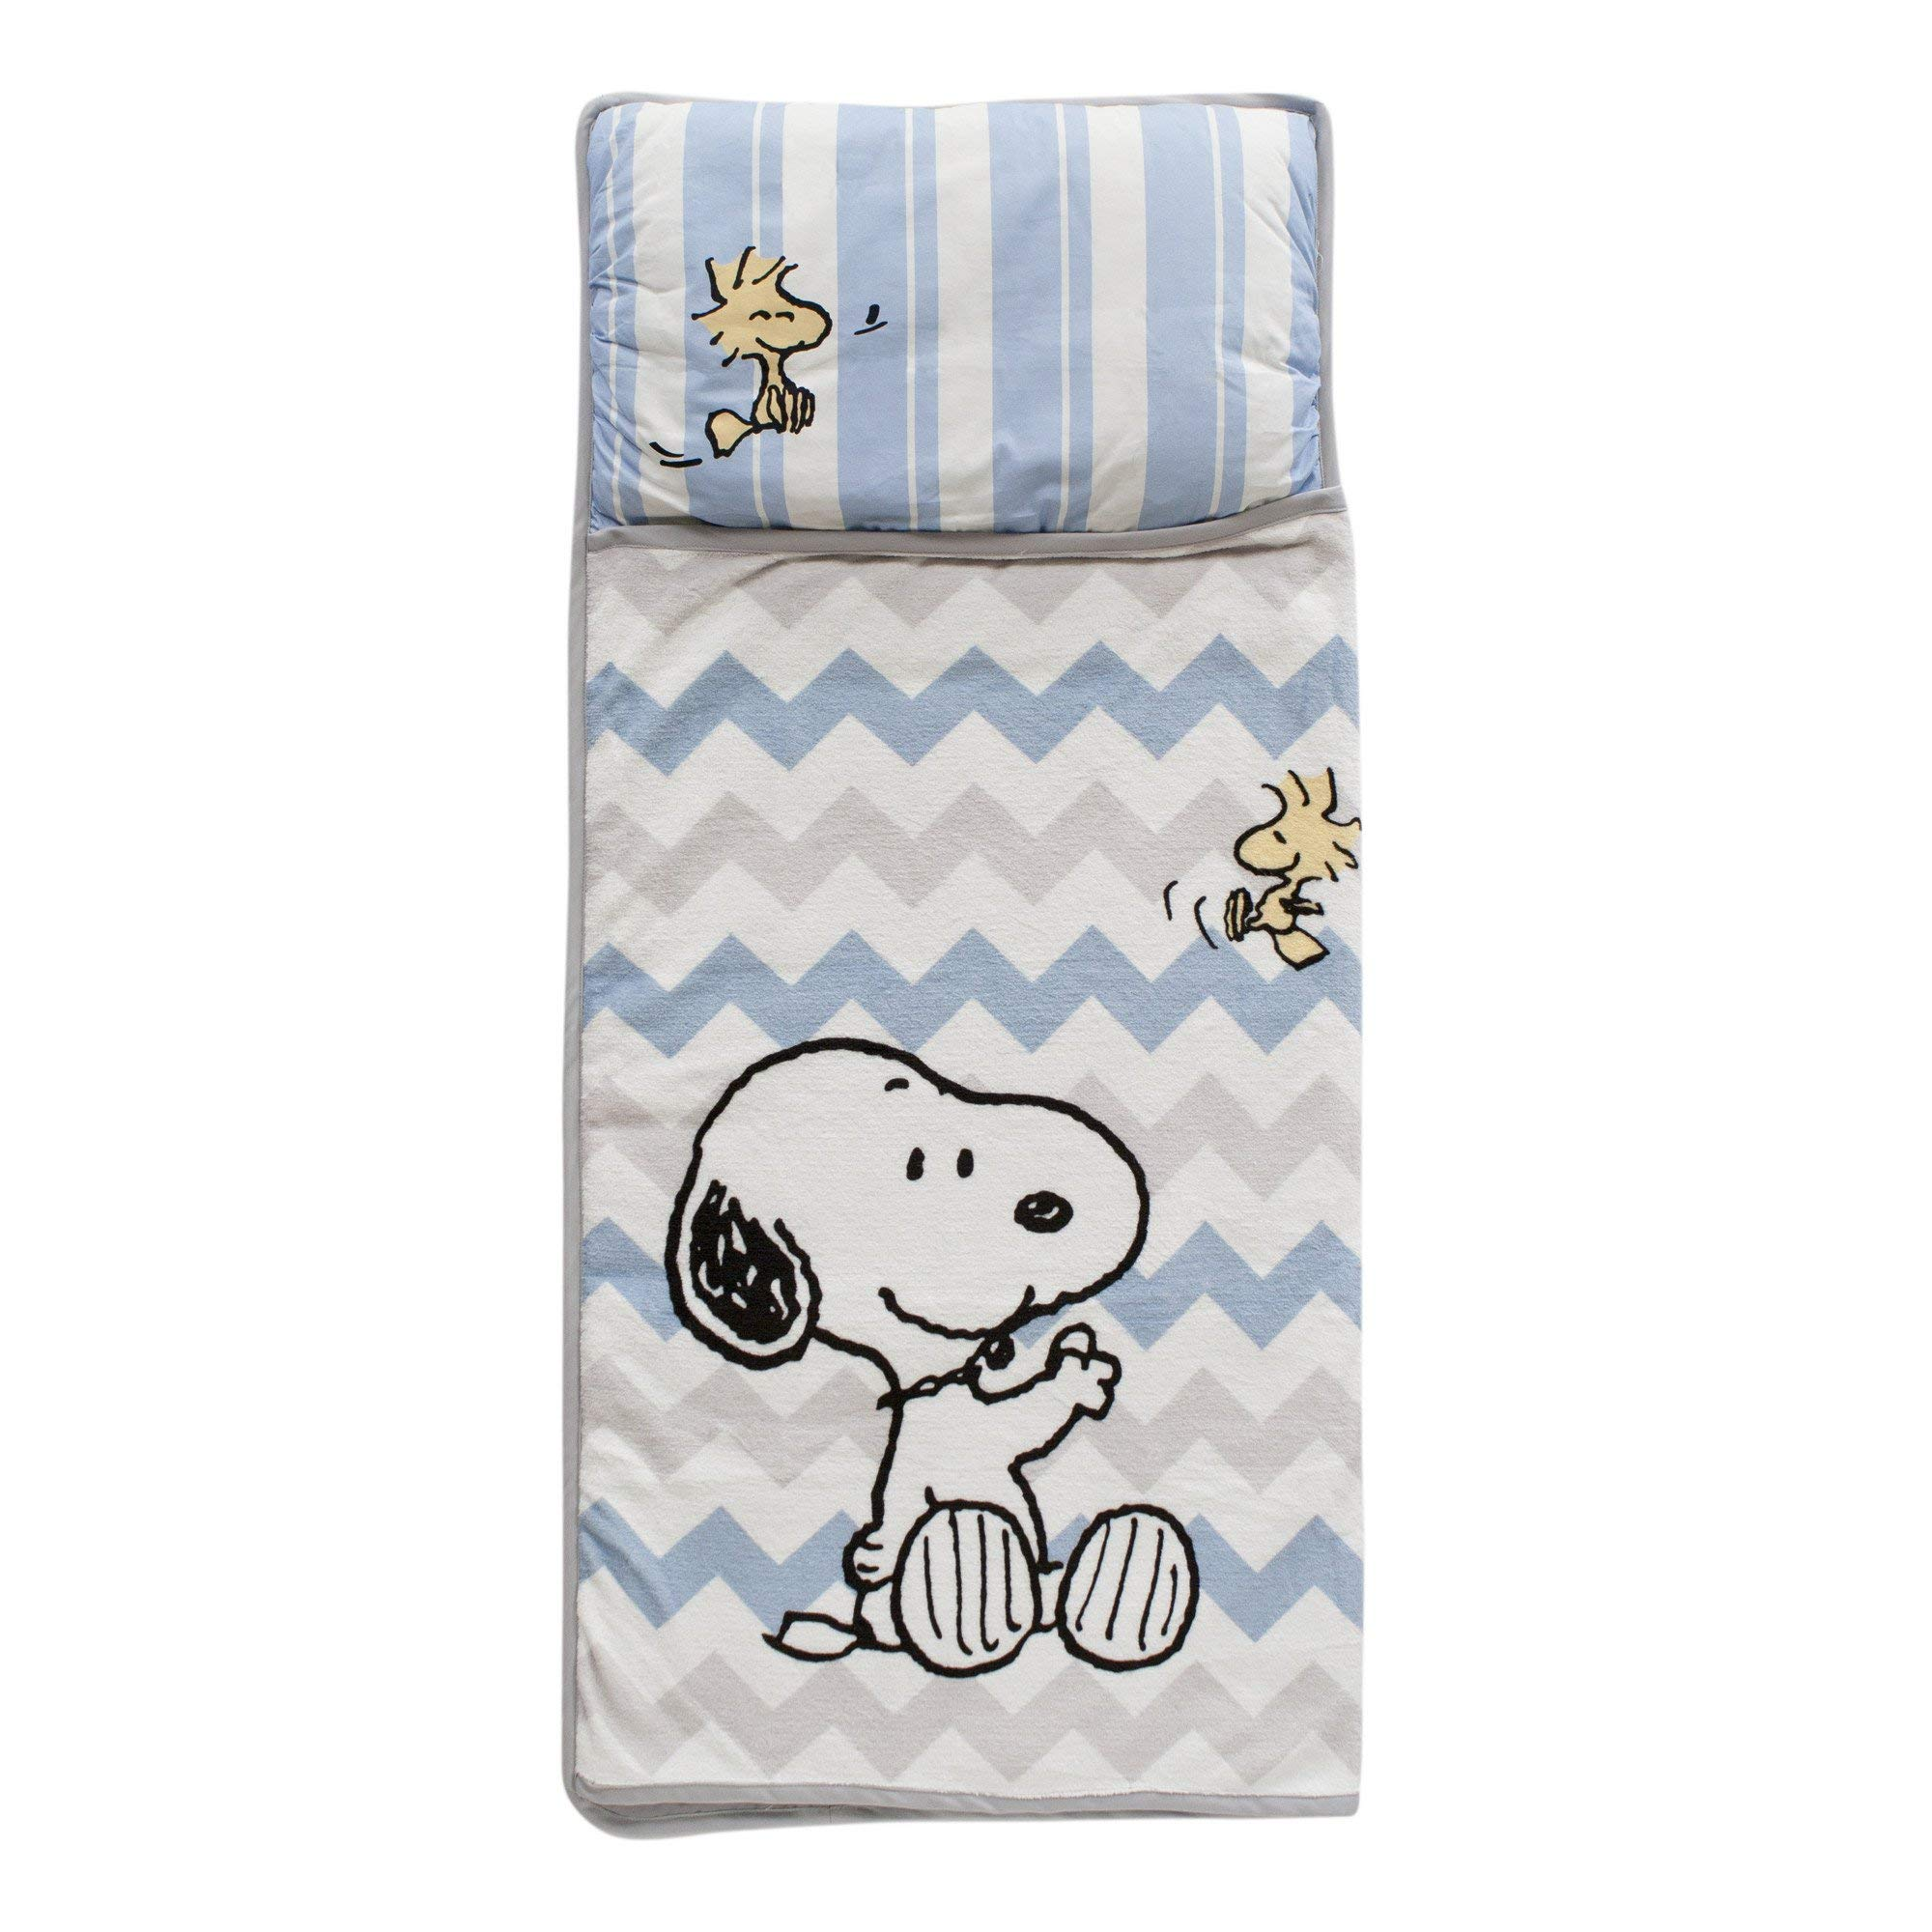 Lambs & Ivy Snoopy Nap Mat, Blue